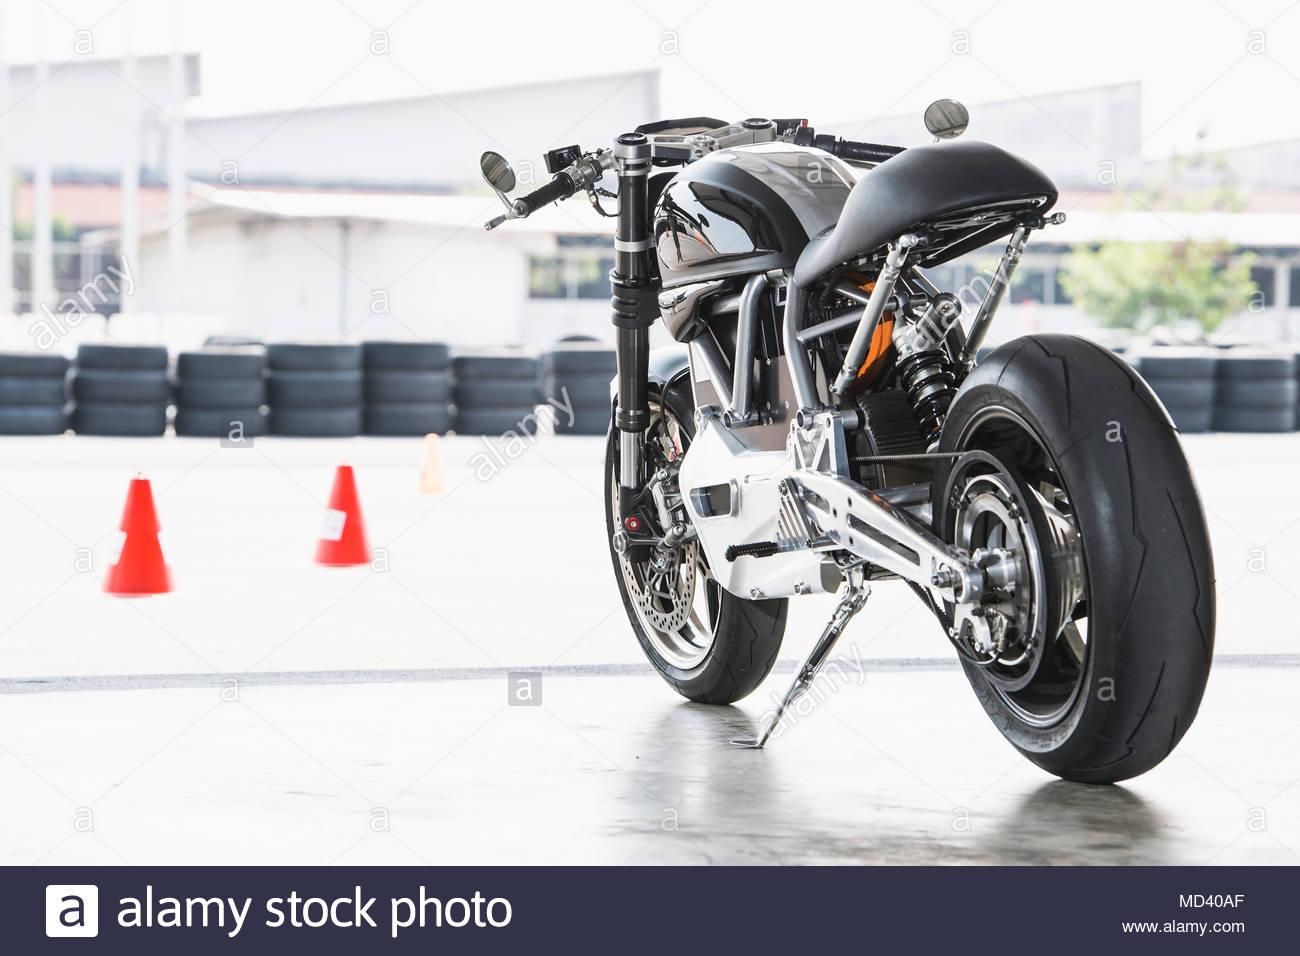 Motorbike Stand Stock Photos & Motorbike Stand Stock Images - Alamy